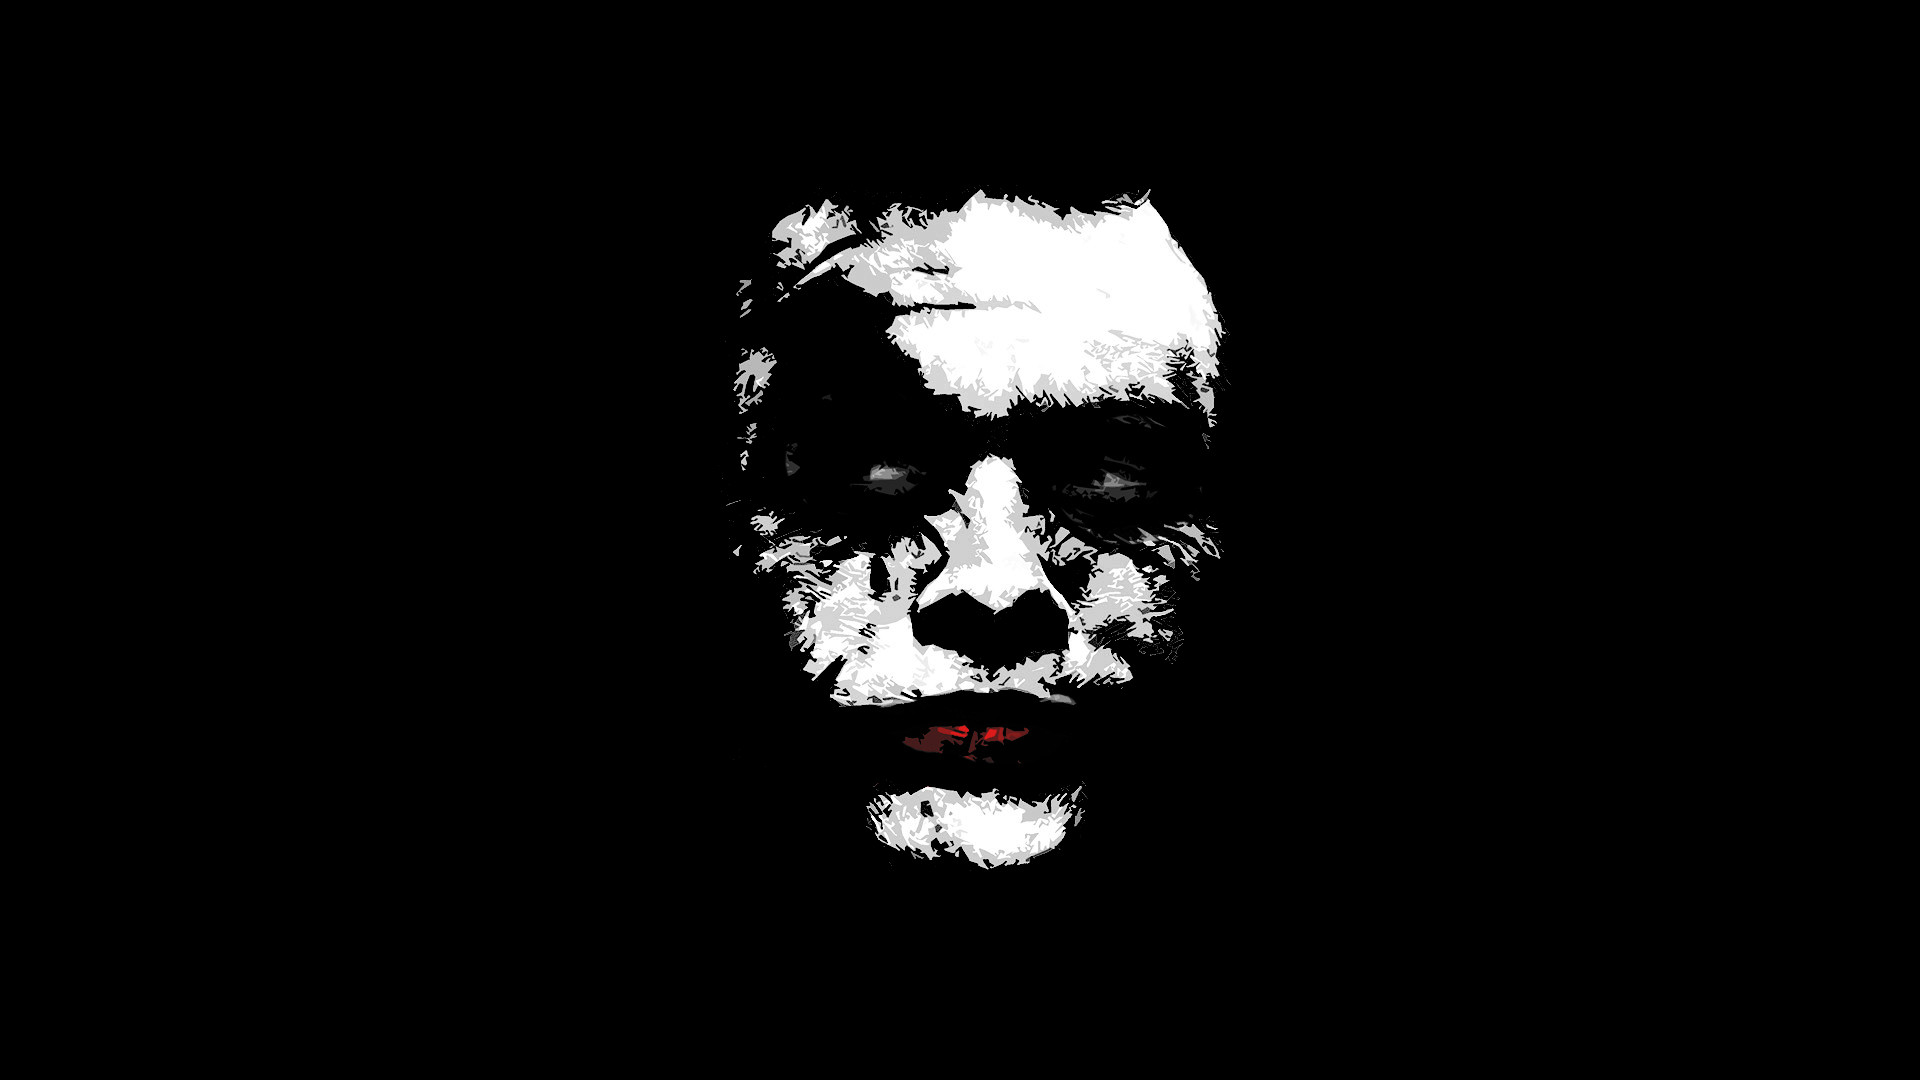 Pretty Black Background 183 ① Wallpapertag